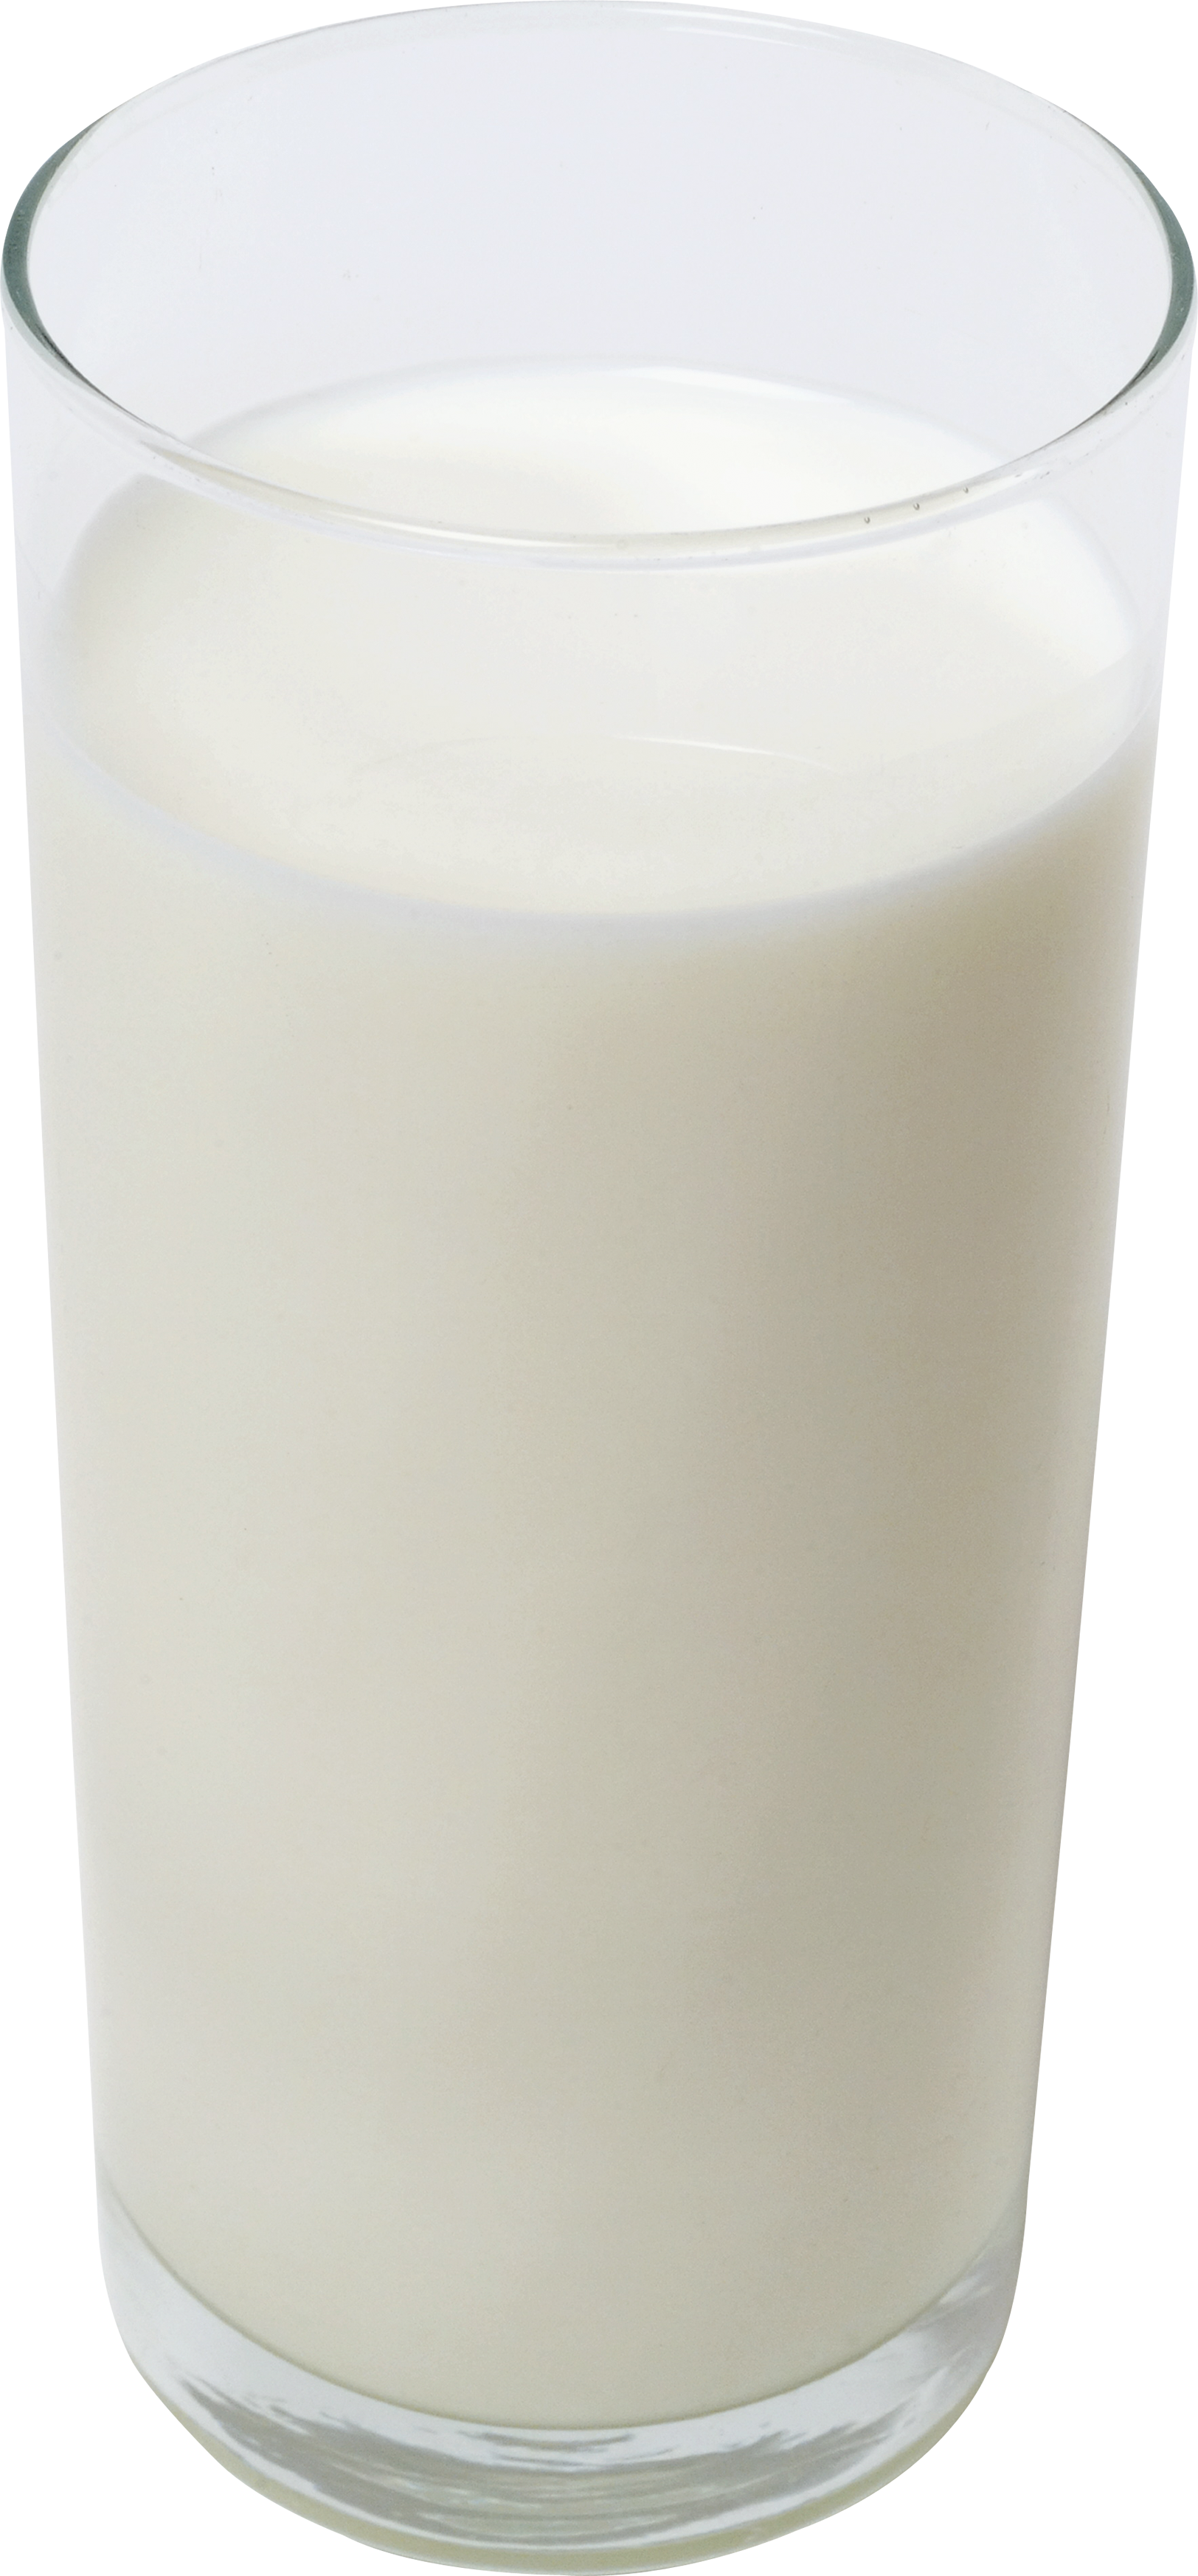 Milk Carton clipart milk jar #6